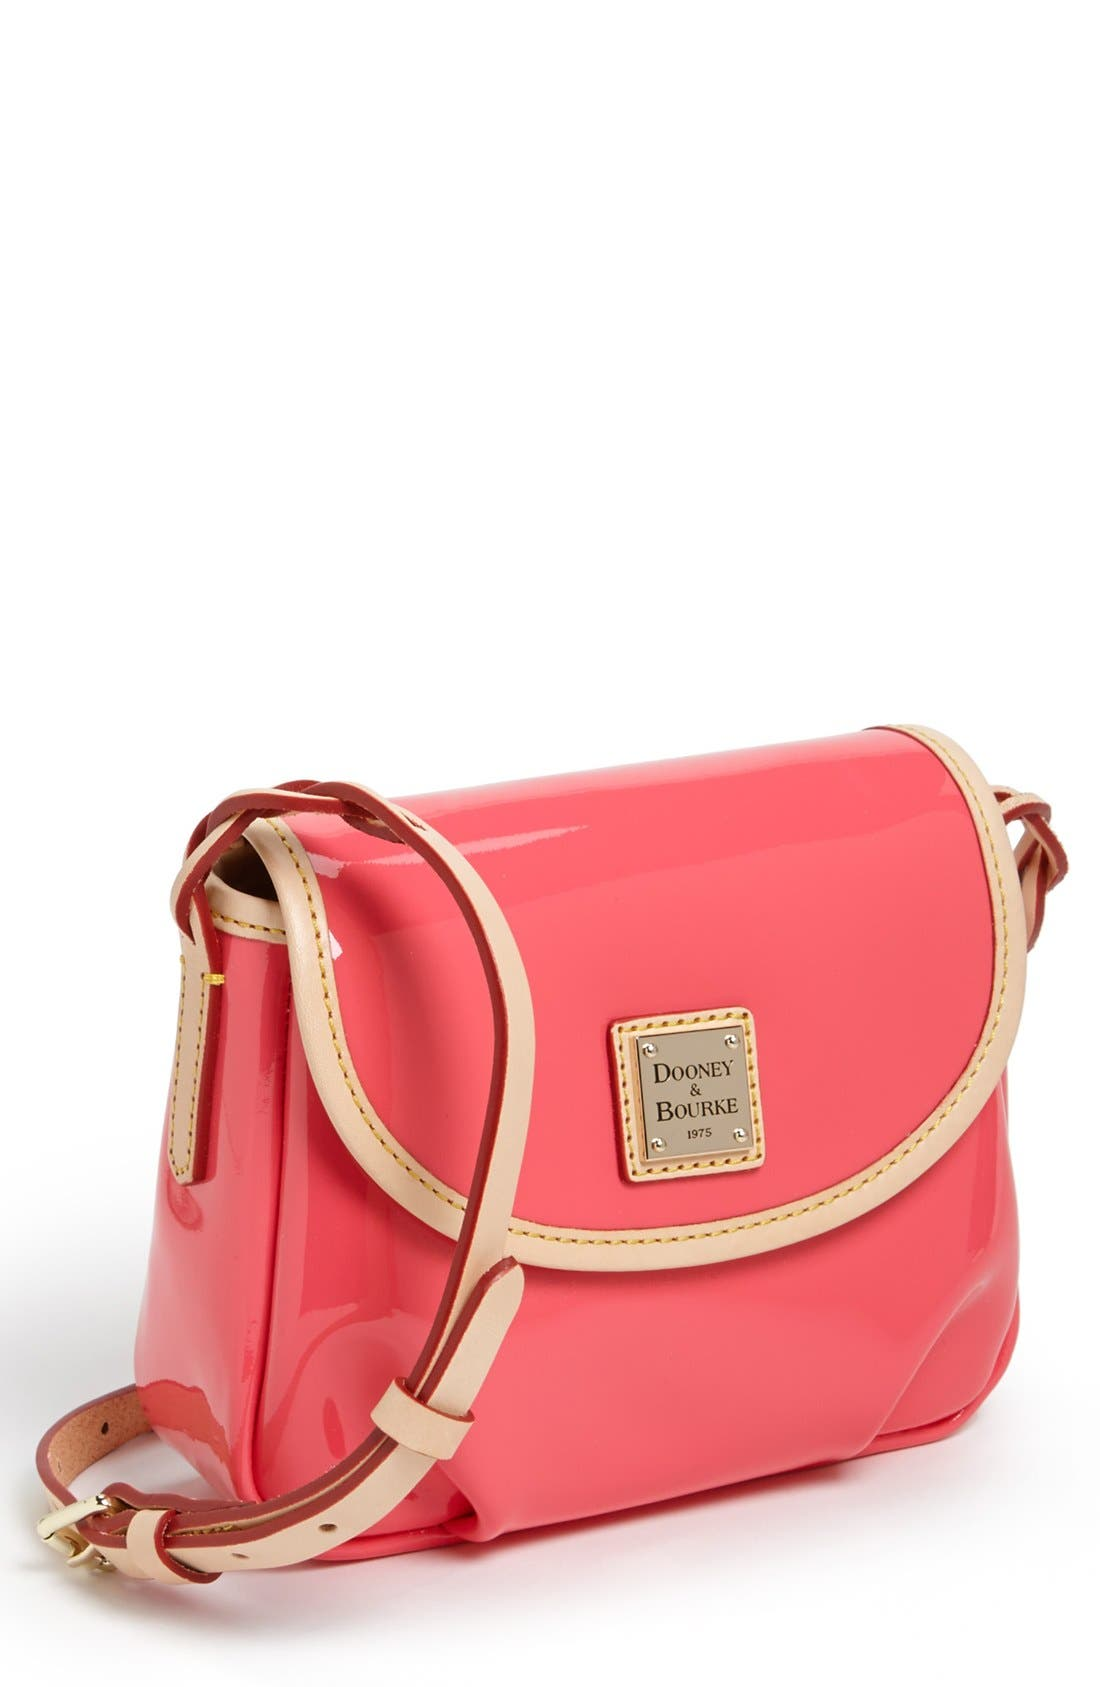 Alternate Image 1 Selected - Dooney & Bourke Patent Leather Crossbody Bag